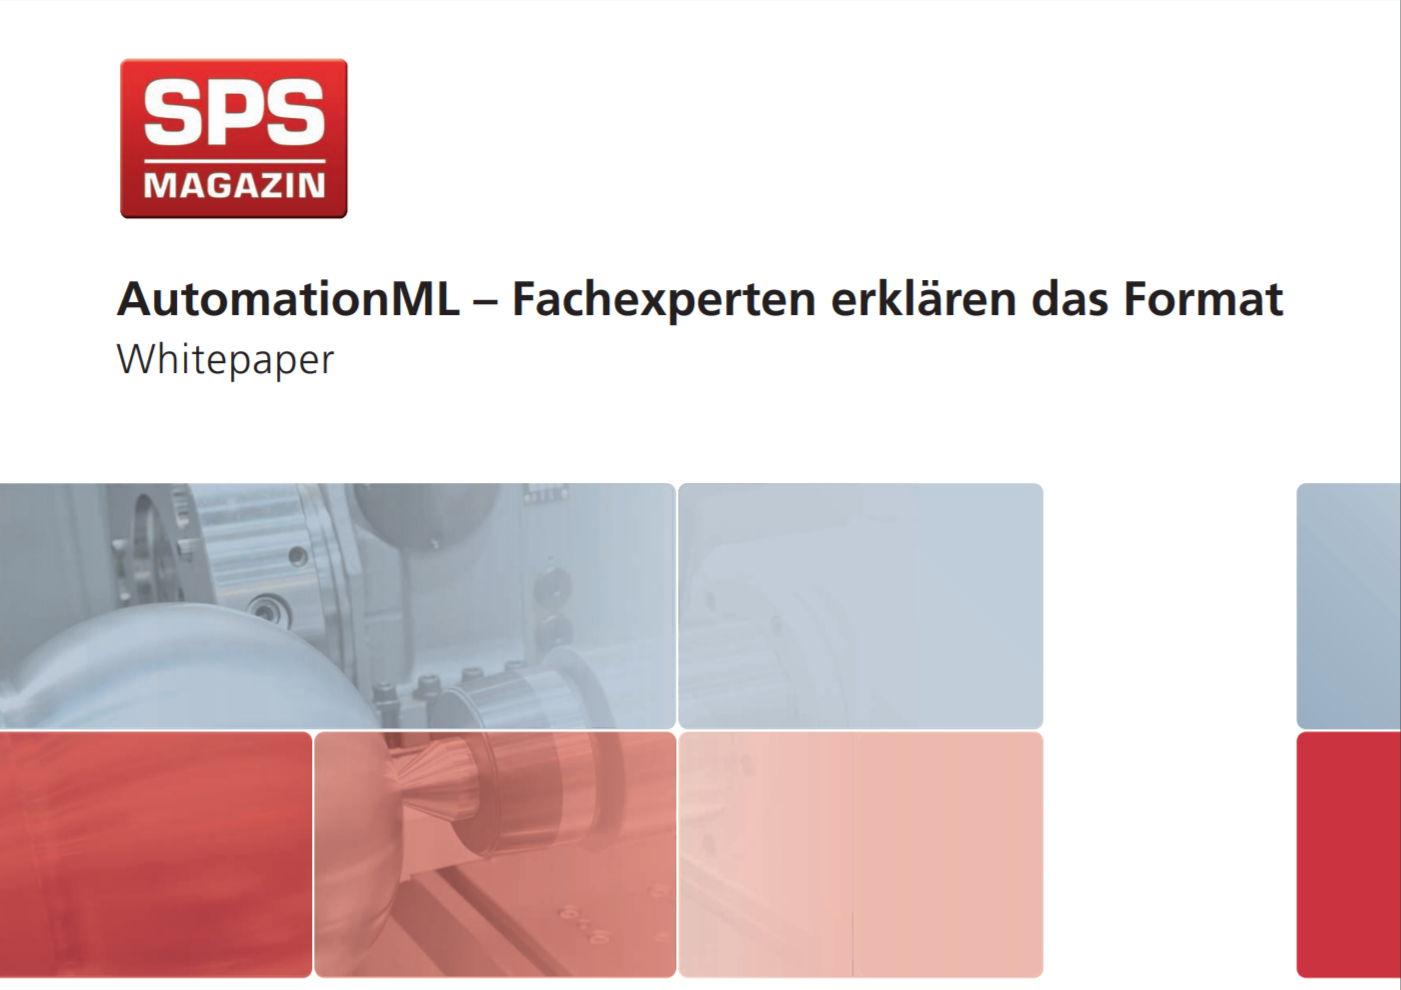 AutomationML – Fachexperten erklären das Format